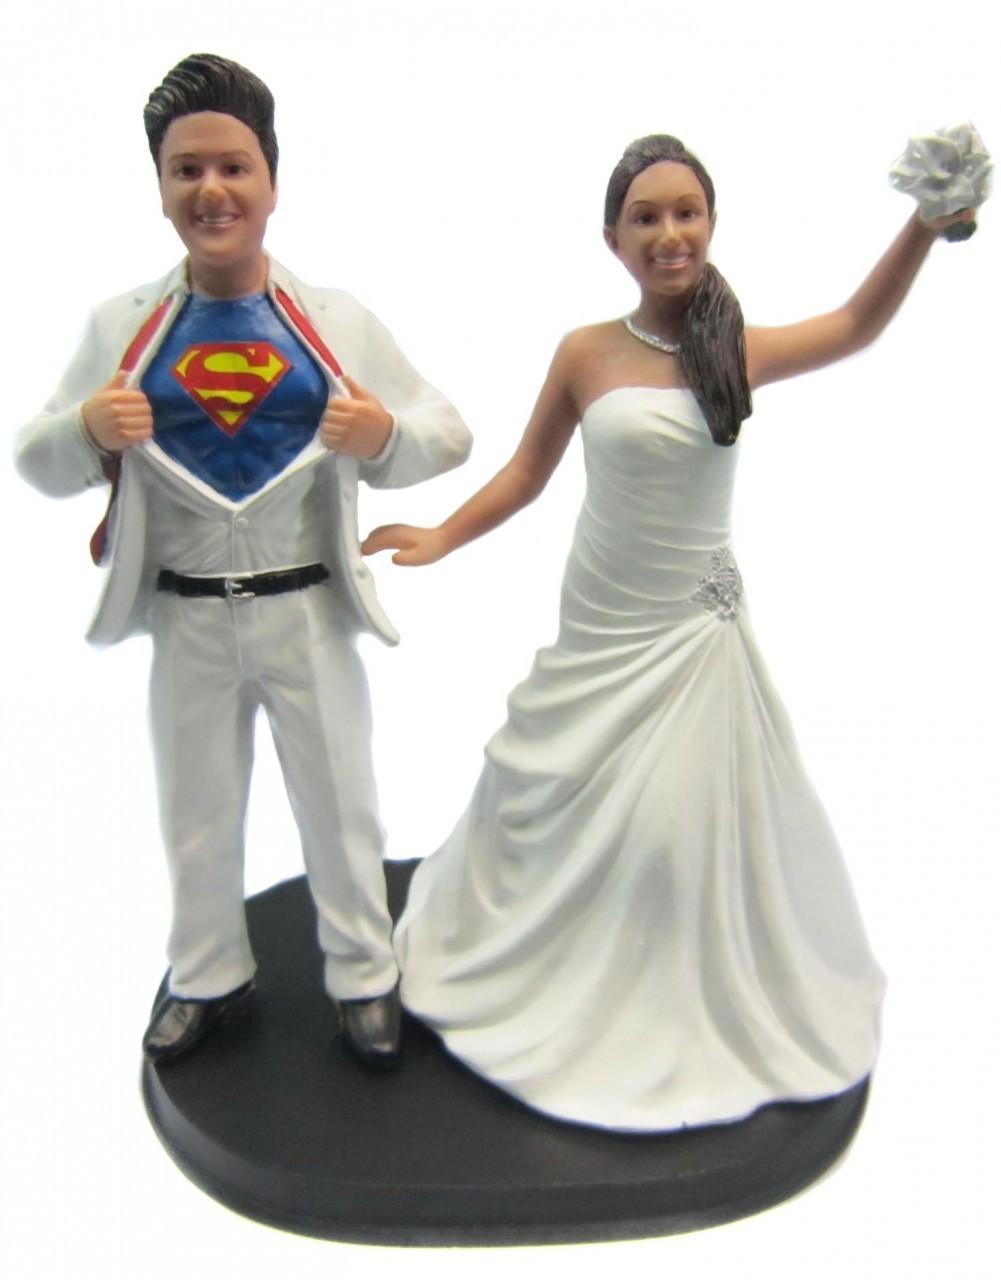 Custom Superman Wedding Cake Toppers